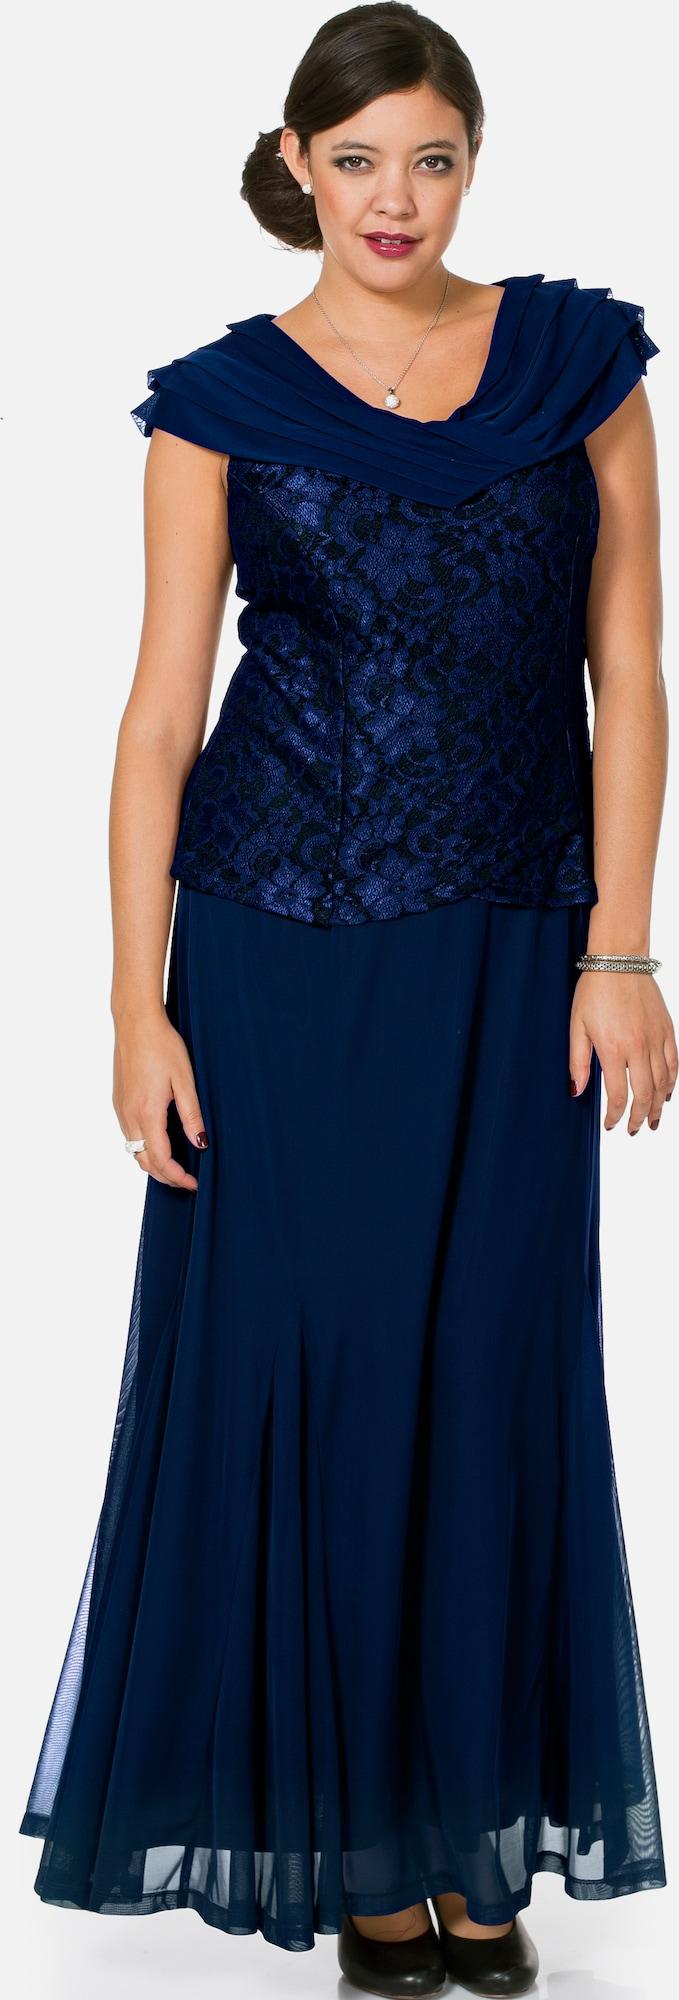 sheego style langes kleid mit spitze in blau about you. Black Bedroom Furniture Sets. Home Design Ideas